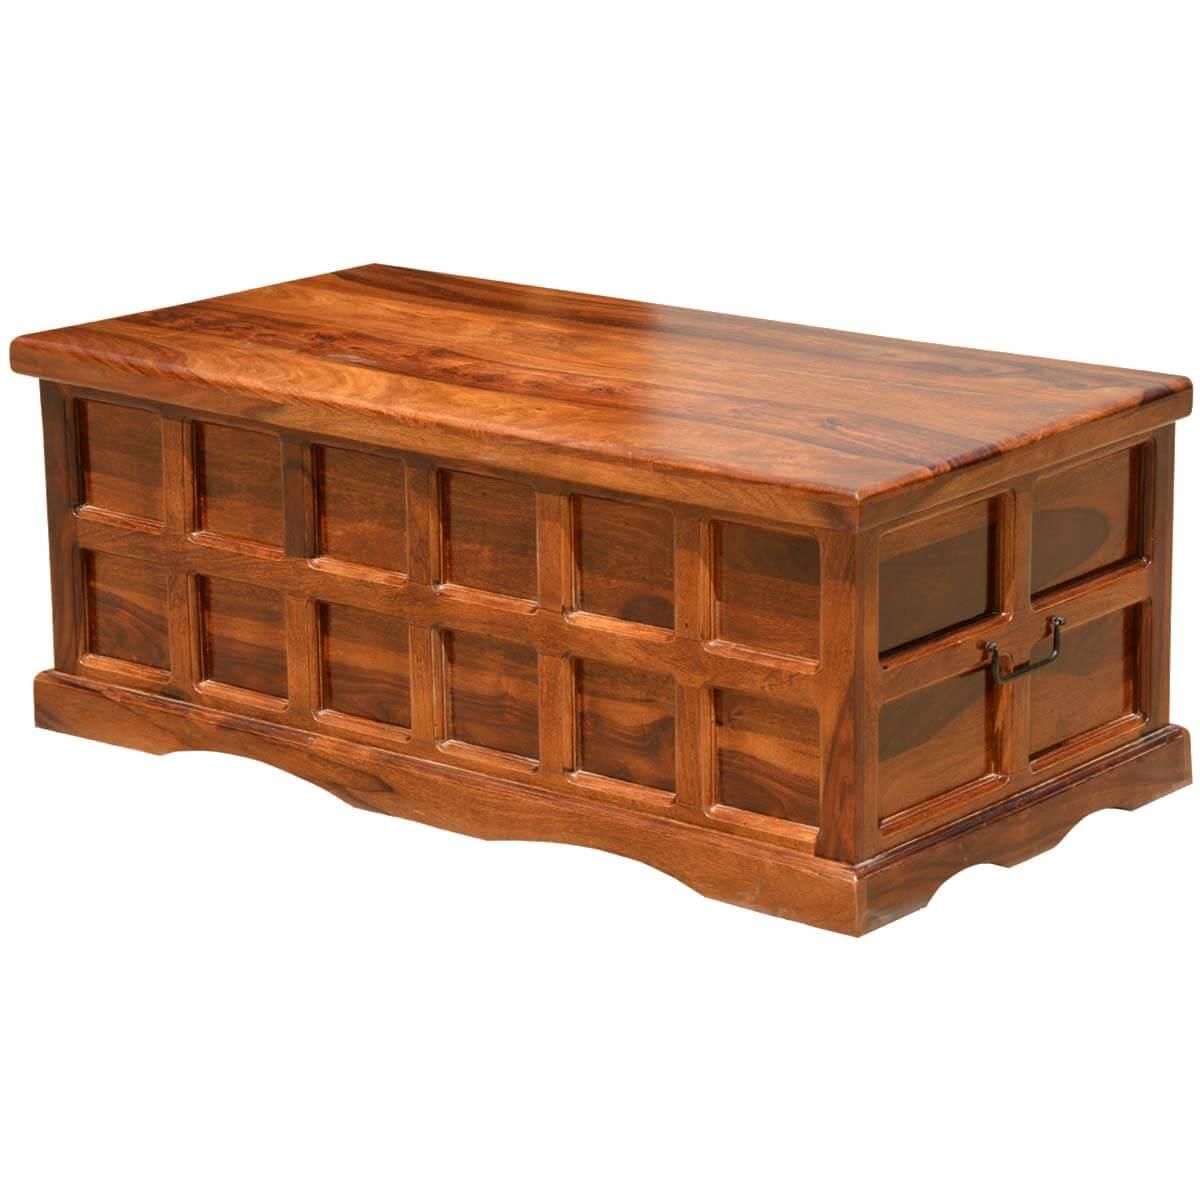 Handmade Solid Wood Island Units